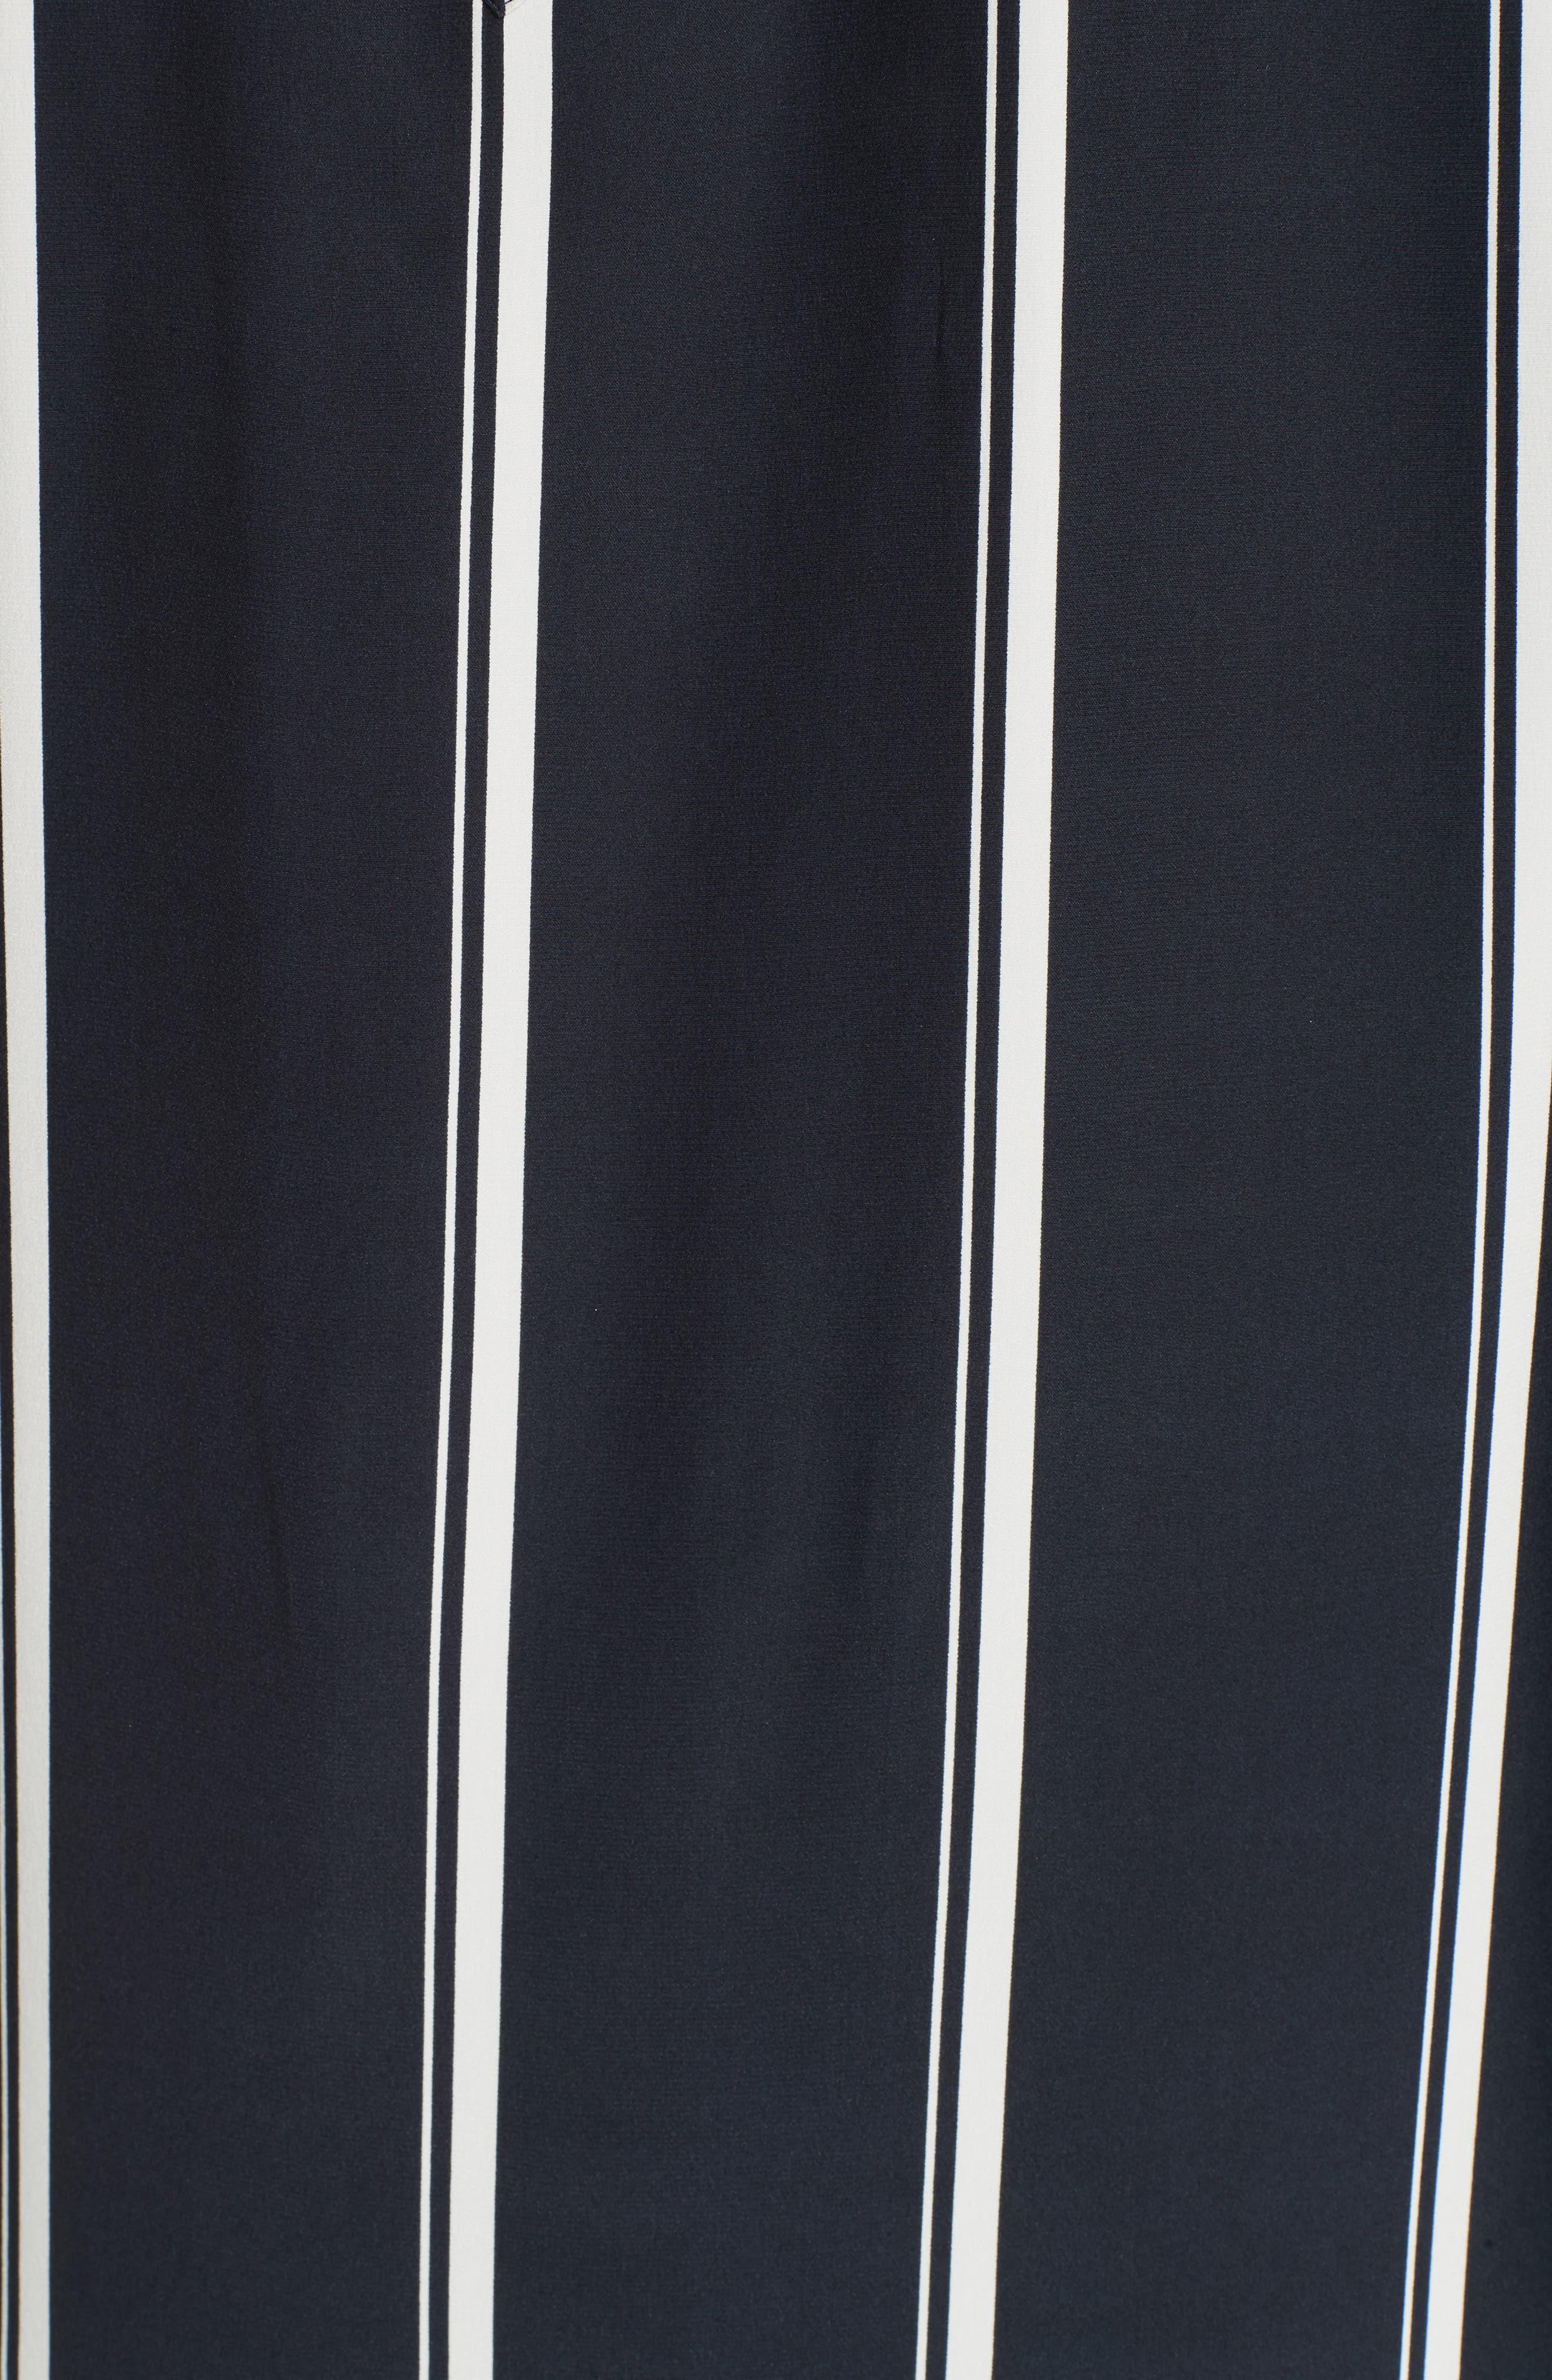 RAG & BONE,                             Jacklin Dress,                             Alternate thumbnail 6, color,                             416